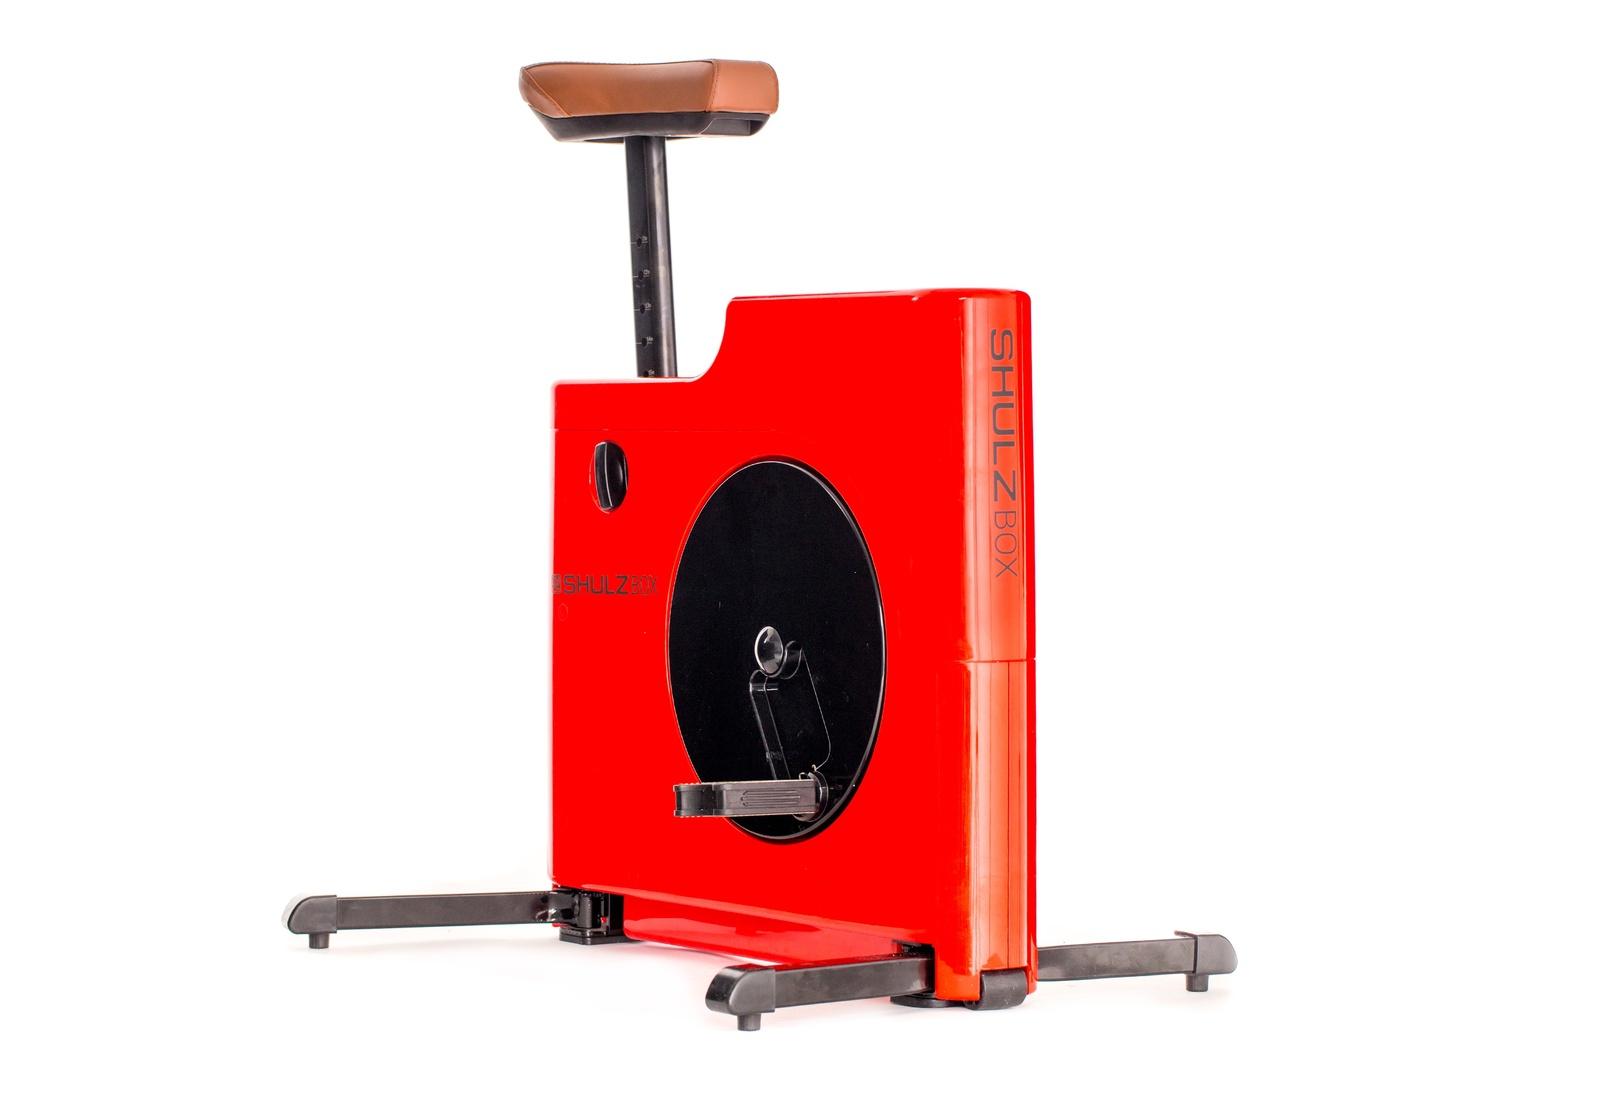 Велотренажер компактный SHULZBOX, красный цена